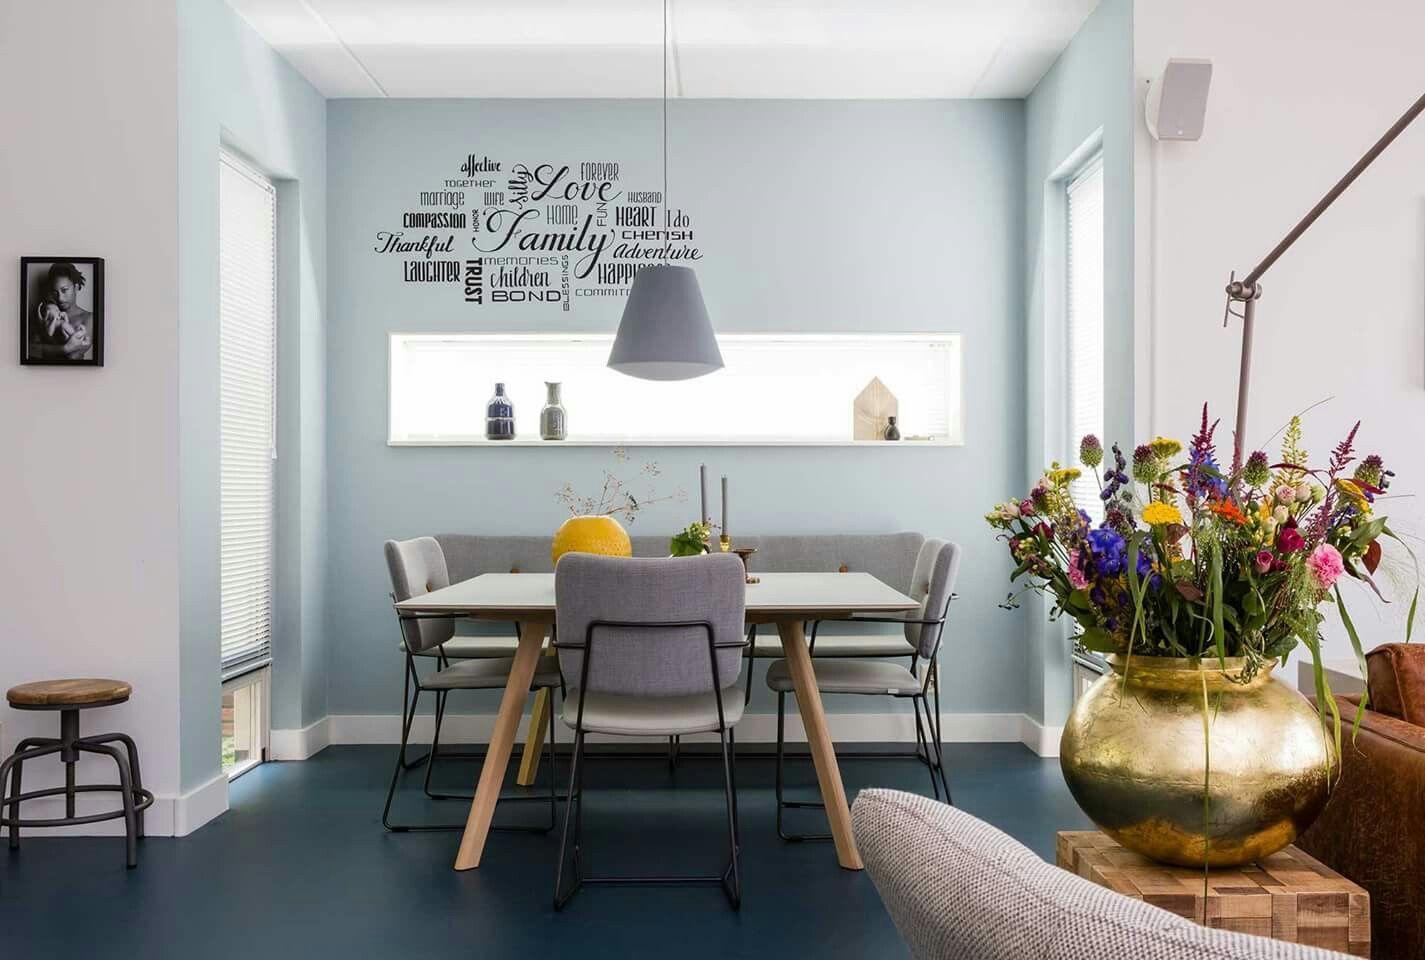 Mooie kleur muur | woonkamer inspiratie | Pinterest